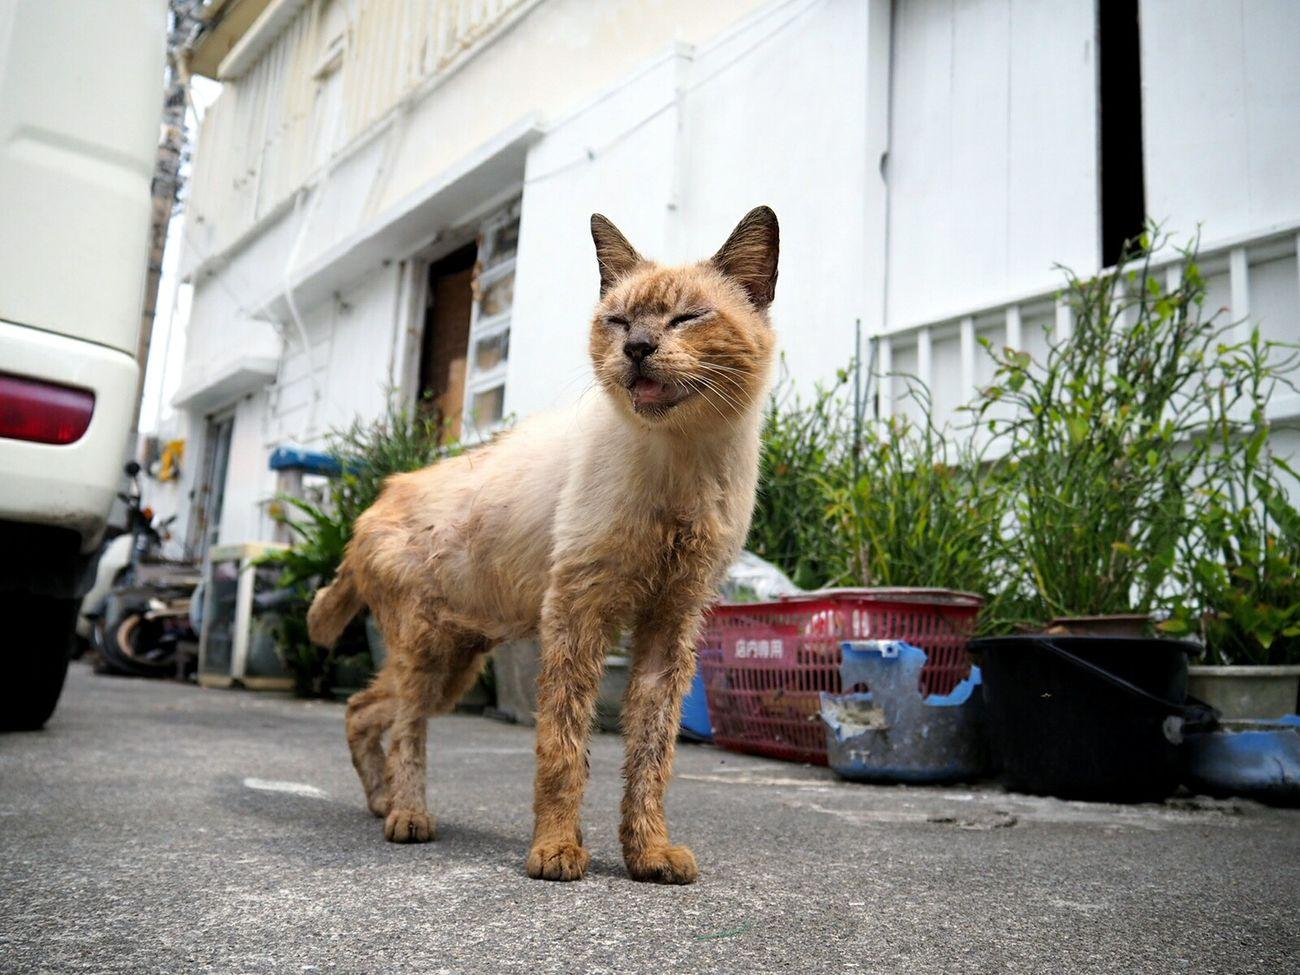 Cat Help Me Naha-shiすまん、助けてやれんにゃ、、、